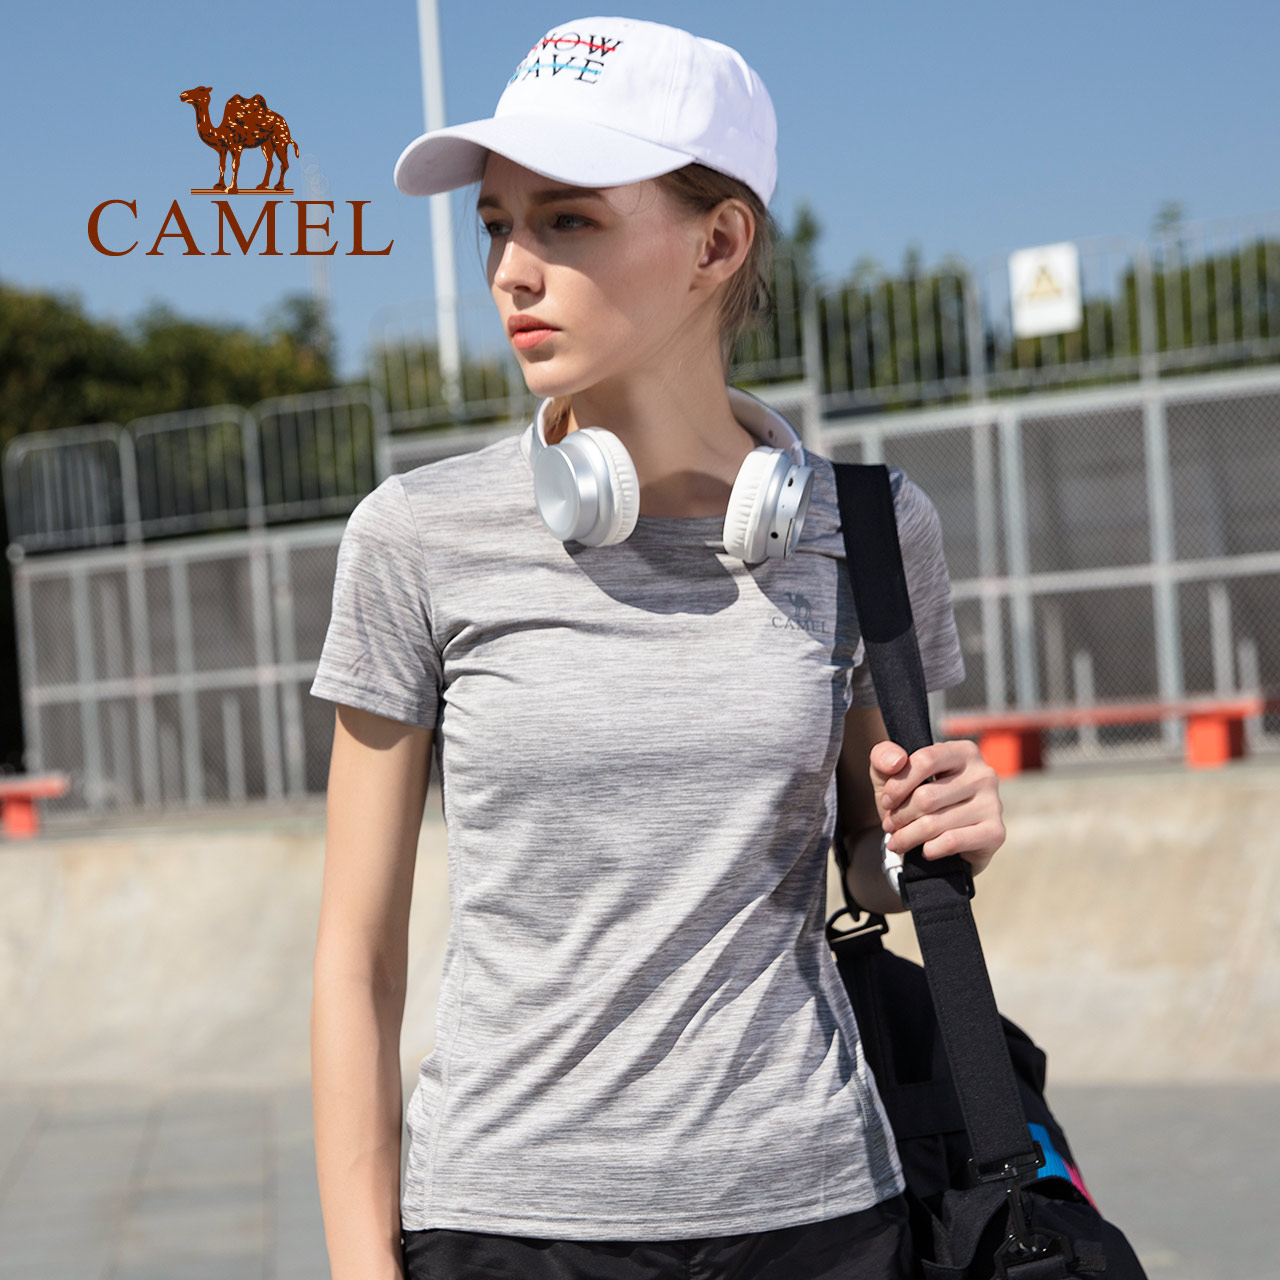 Camel/骆驼户外运动T恤女款 春夏舒适休闲透气速干短袖圆领女上衣